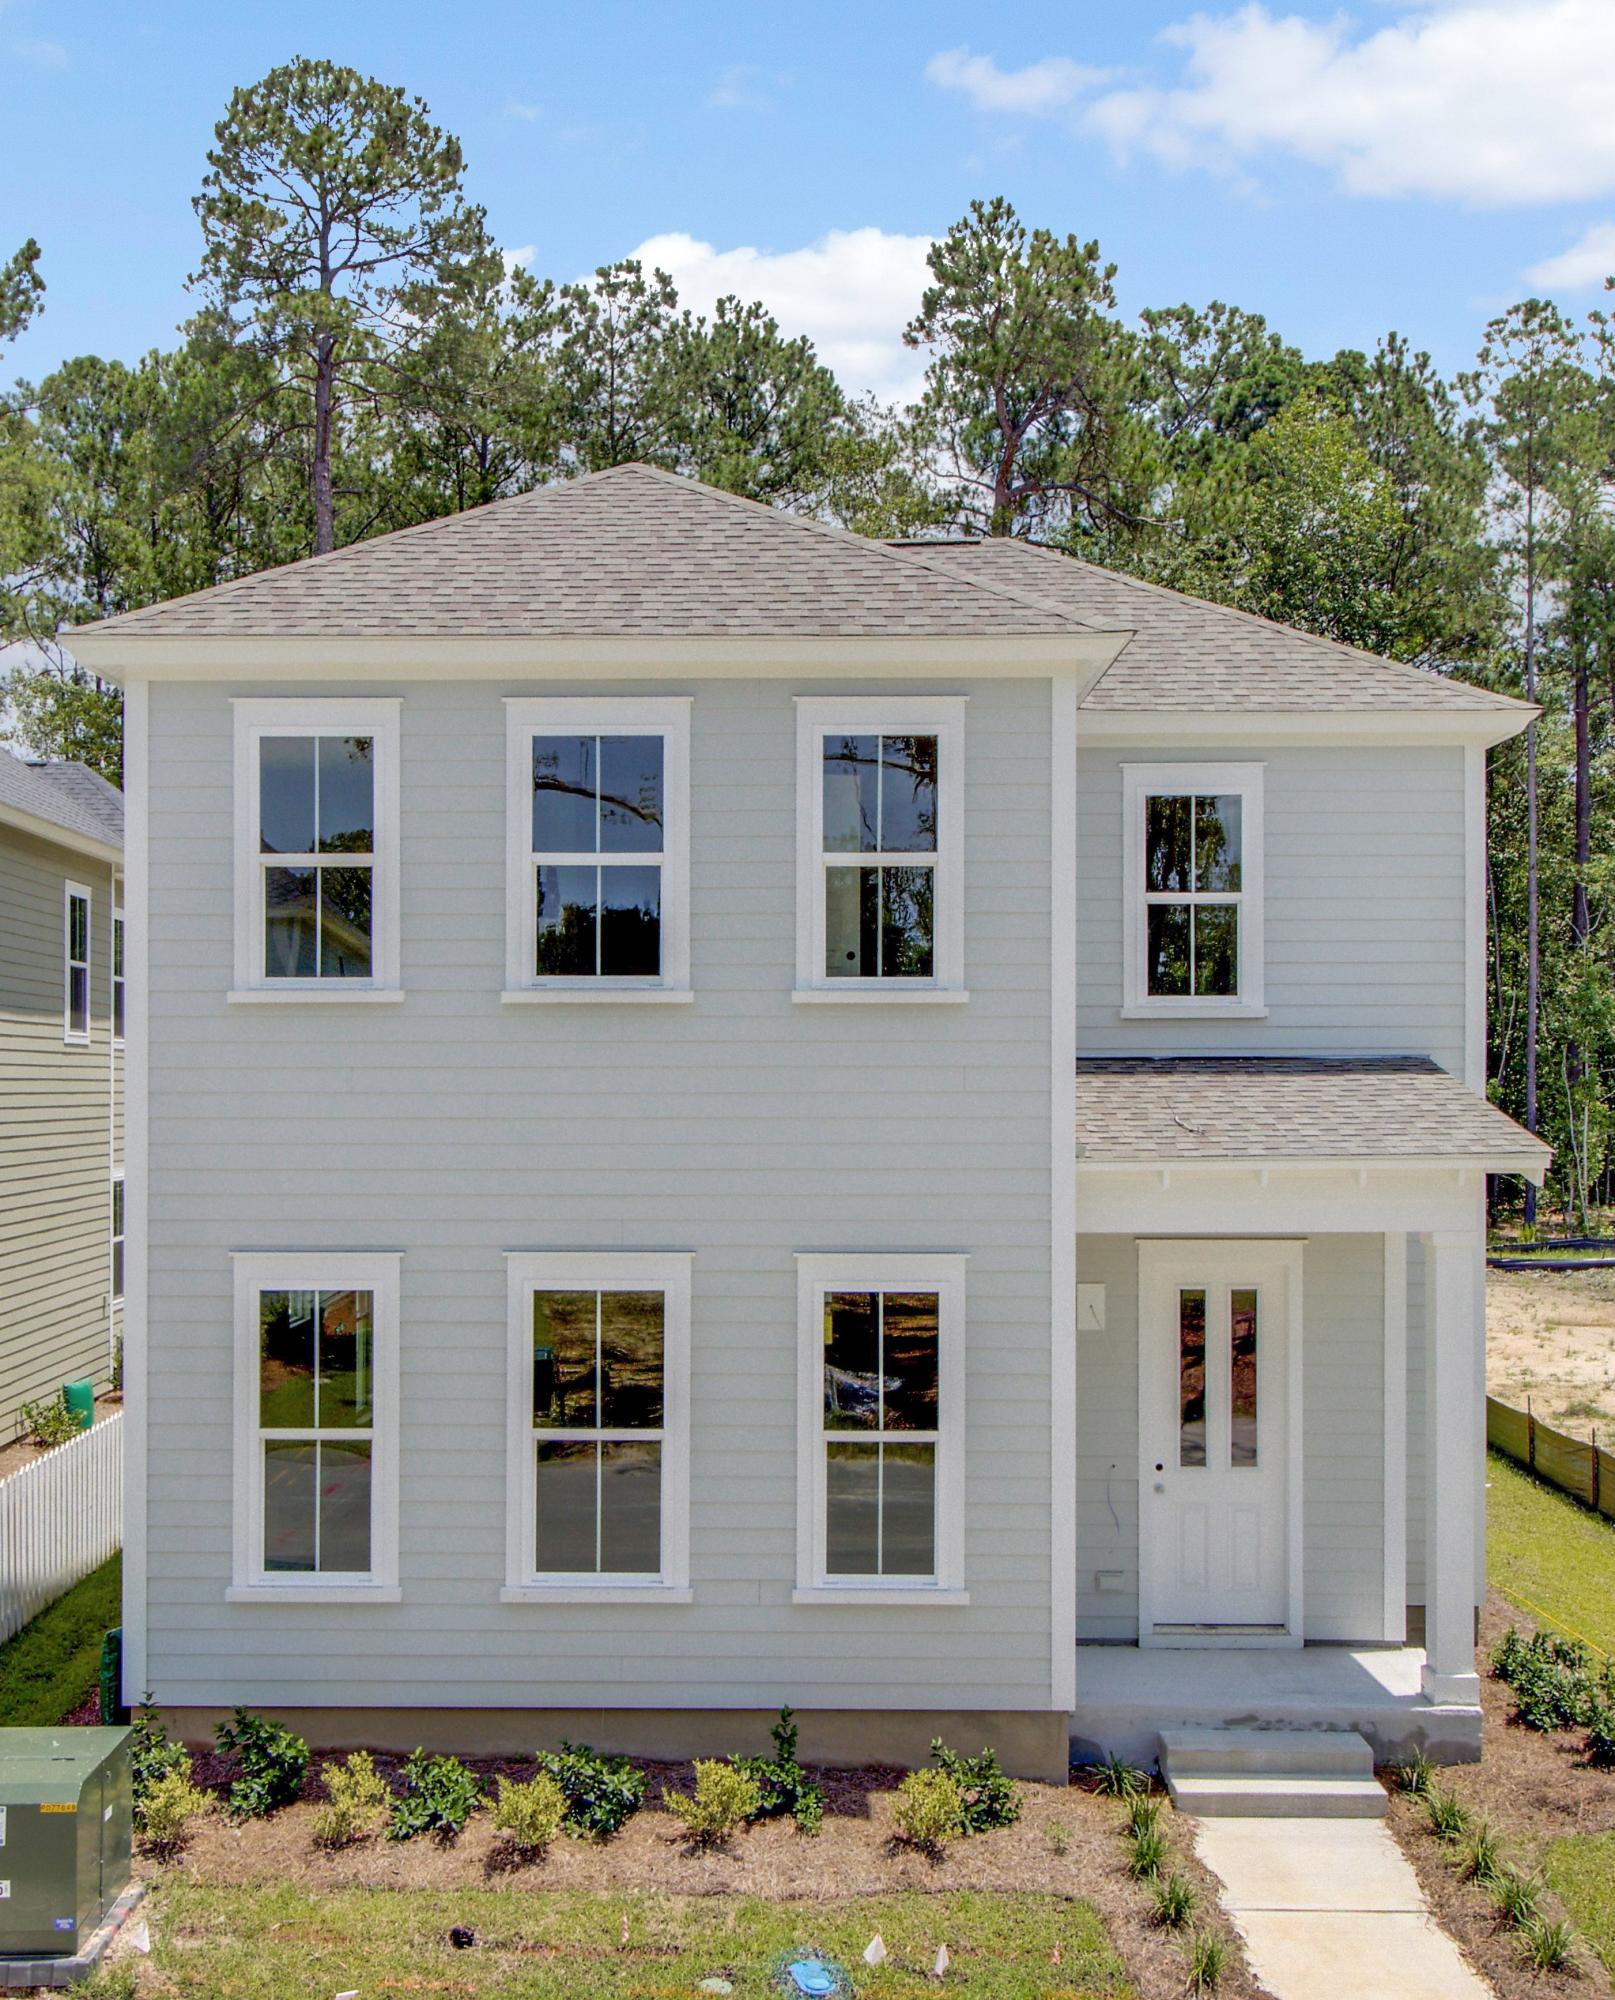 Fulton Park Homes For Sale - 1206 Max, Mount Pleasant, SC - 26